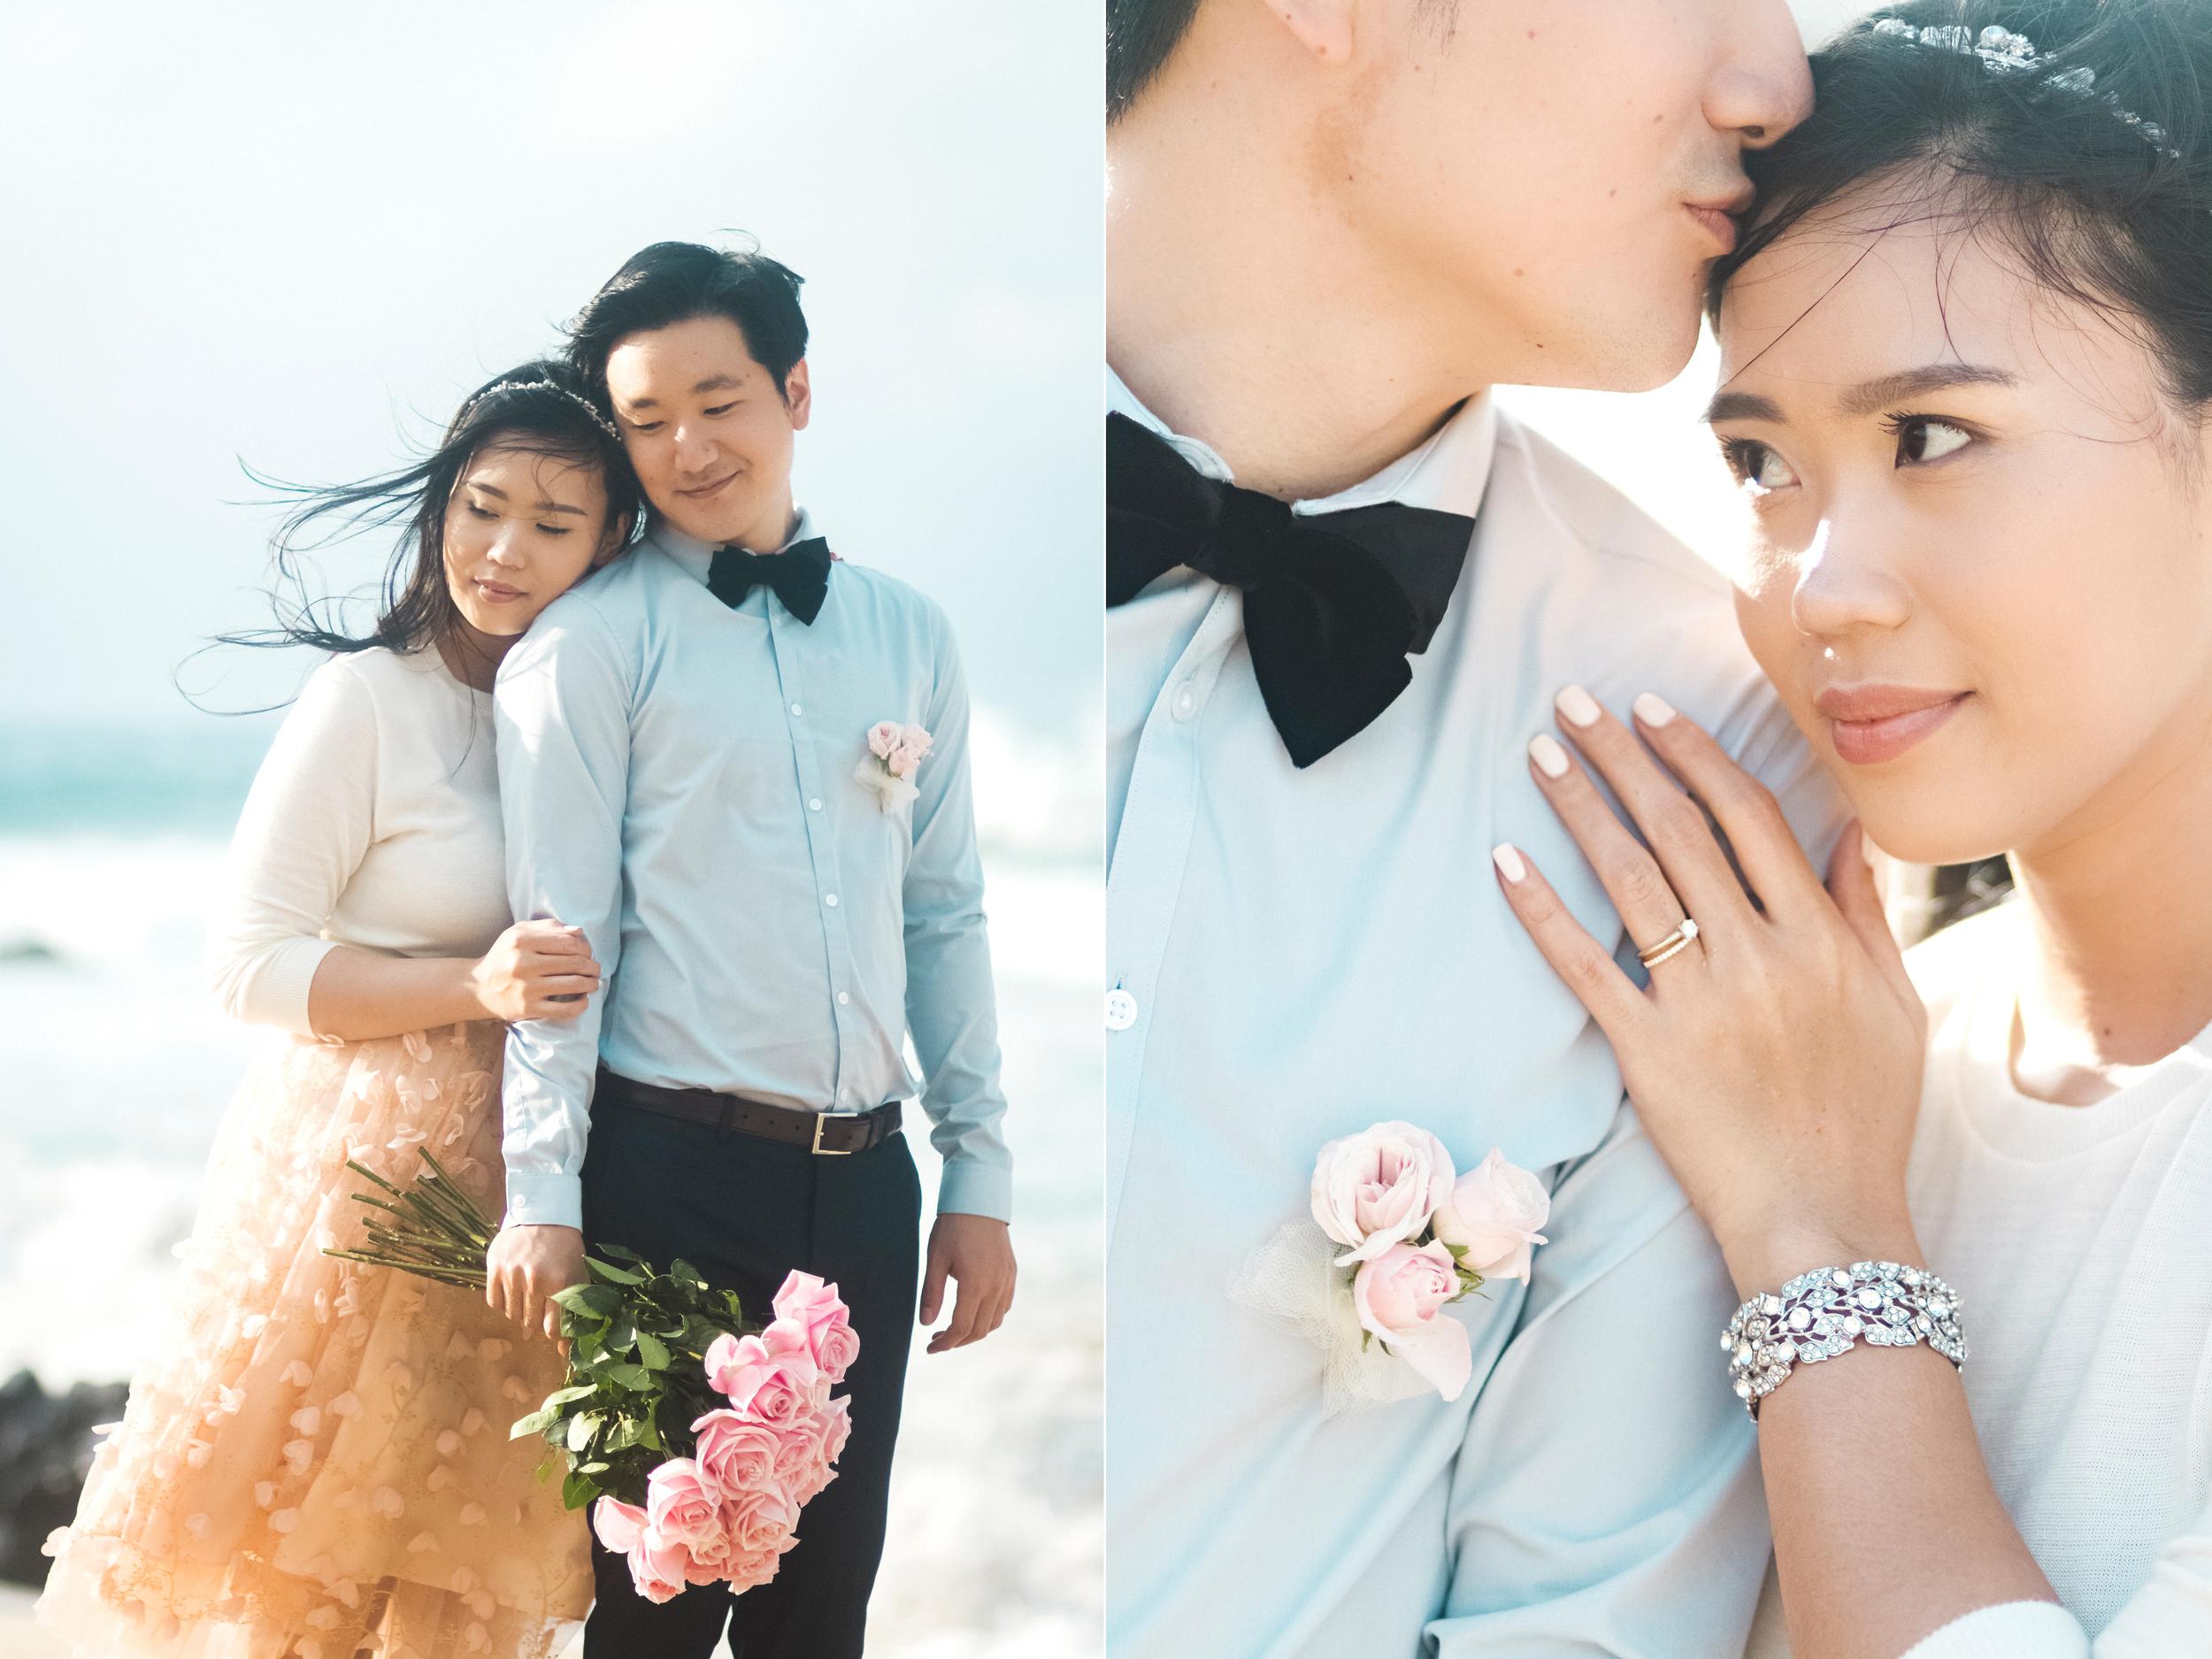 angie-diaz-photography-maui-elopement-ironwoods-beach-wedding-2.jpg